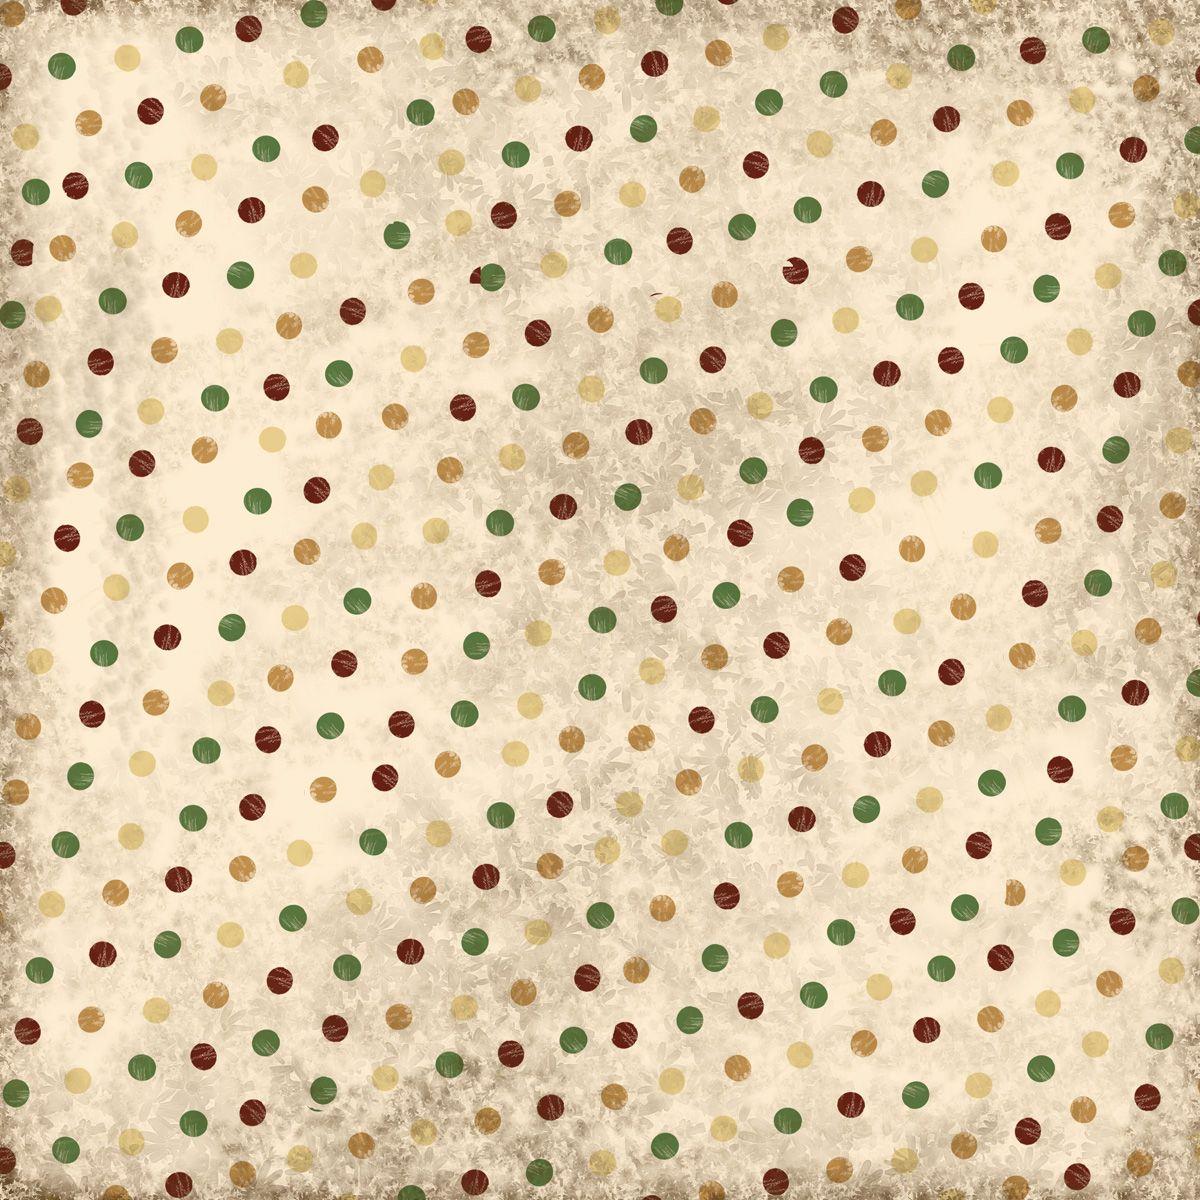 Scrapbook Paper Aged Dots Free Digital Scrapbook Paper